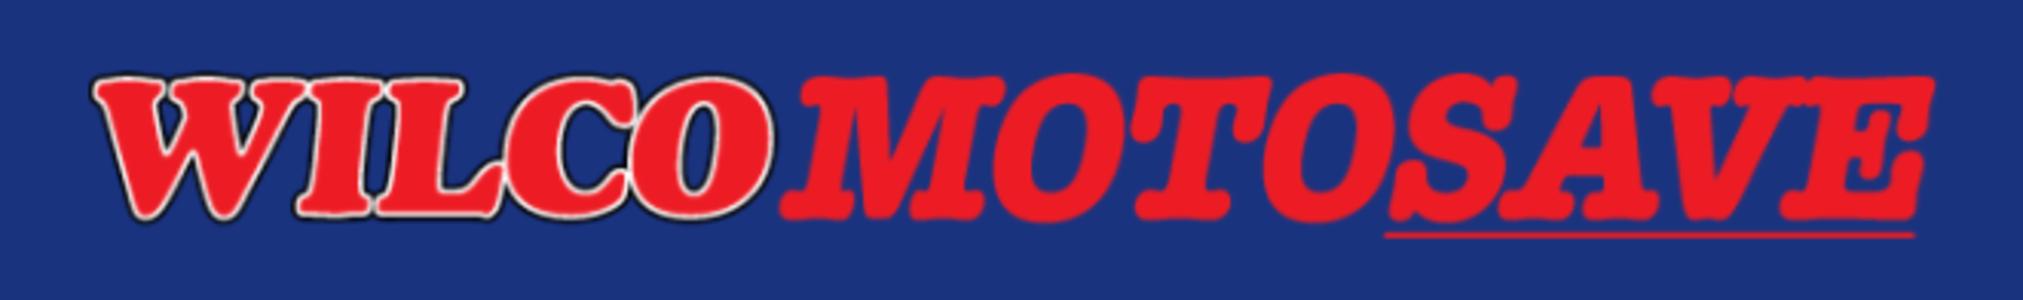 Wilco Motosave - Hunslet